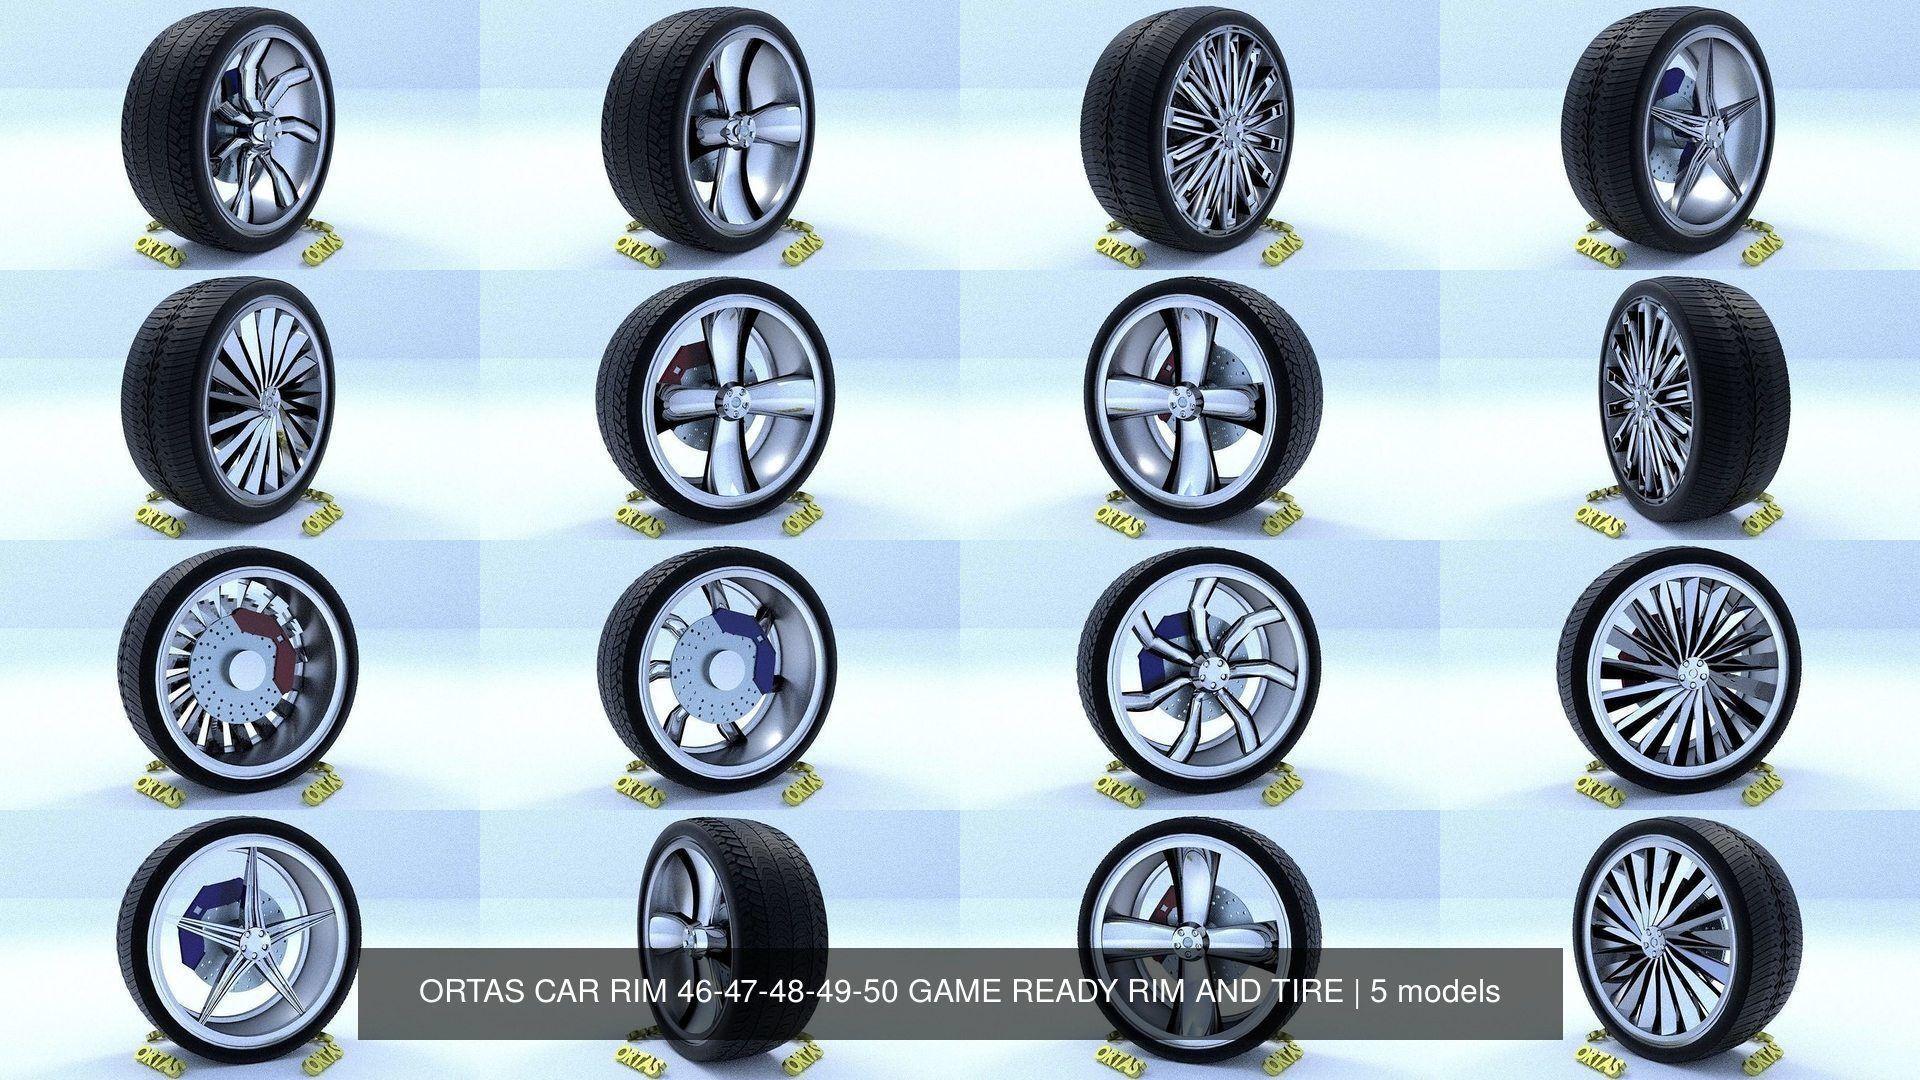 ORTAS CAR RIM 46-47-48-49-50 GAME READY RIM AND TIRE